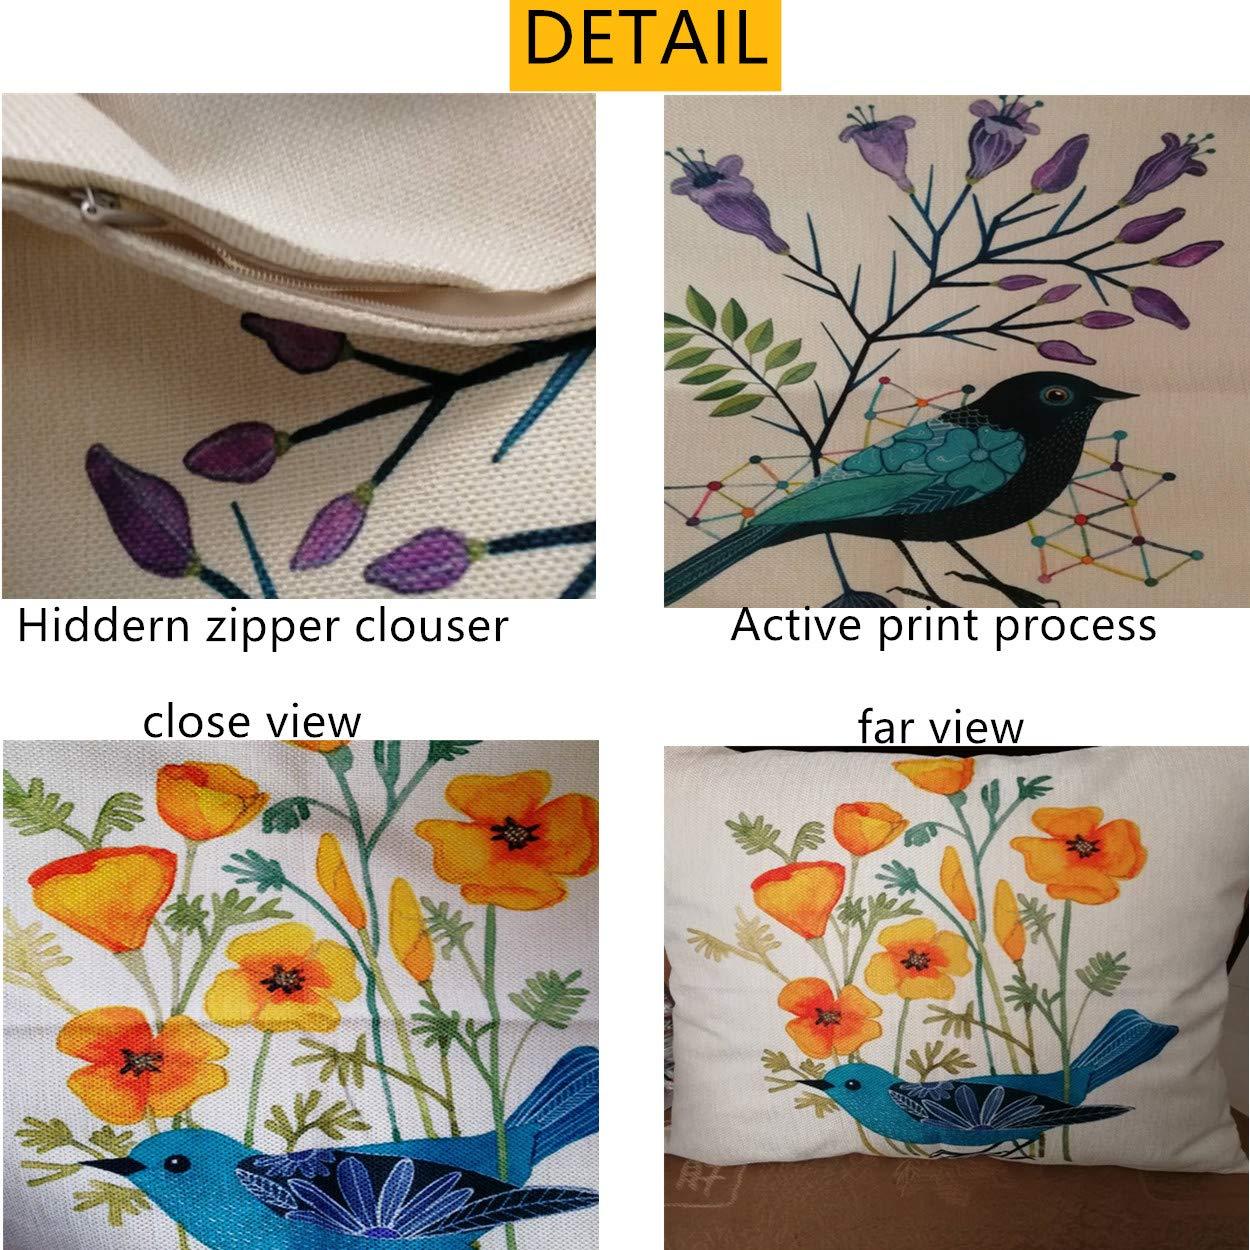 Unibedding Outdoor Decorative Throw Pillow Covers Case Birds D/écor Vintage Spring Cushion Cotton Linen 18x18 Set of 2 Patio Couch Sofa